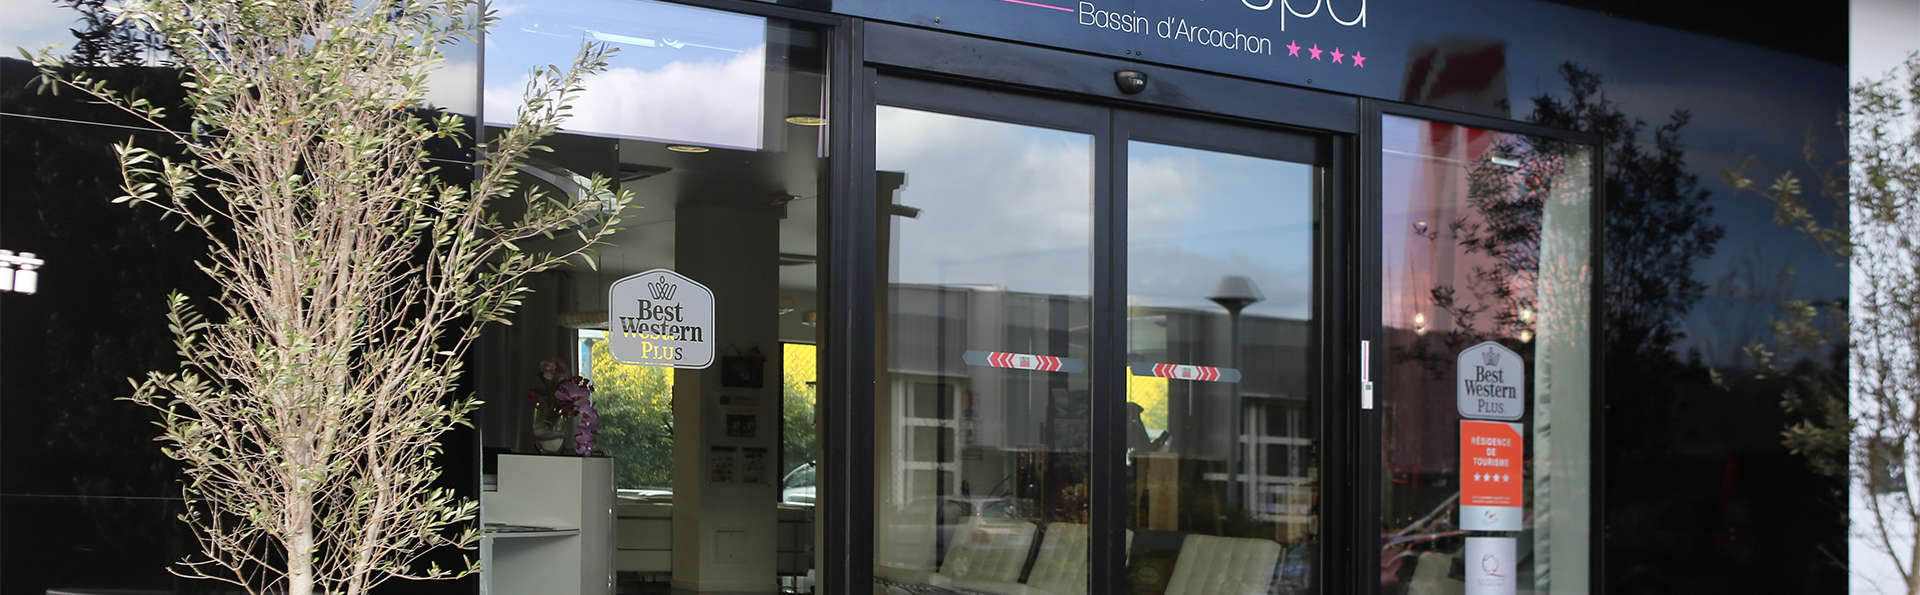 Best Western Plus - Design & Spa Bassin d'Arcachon - EDIT_entrance.jpg